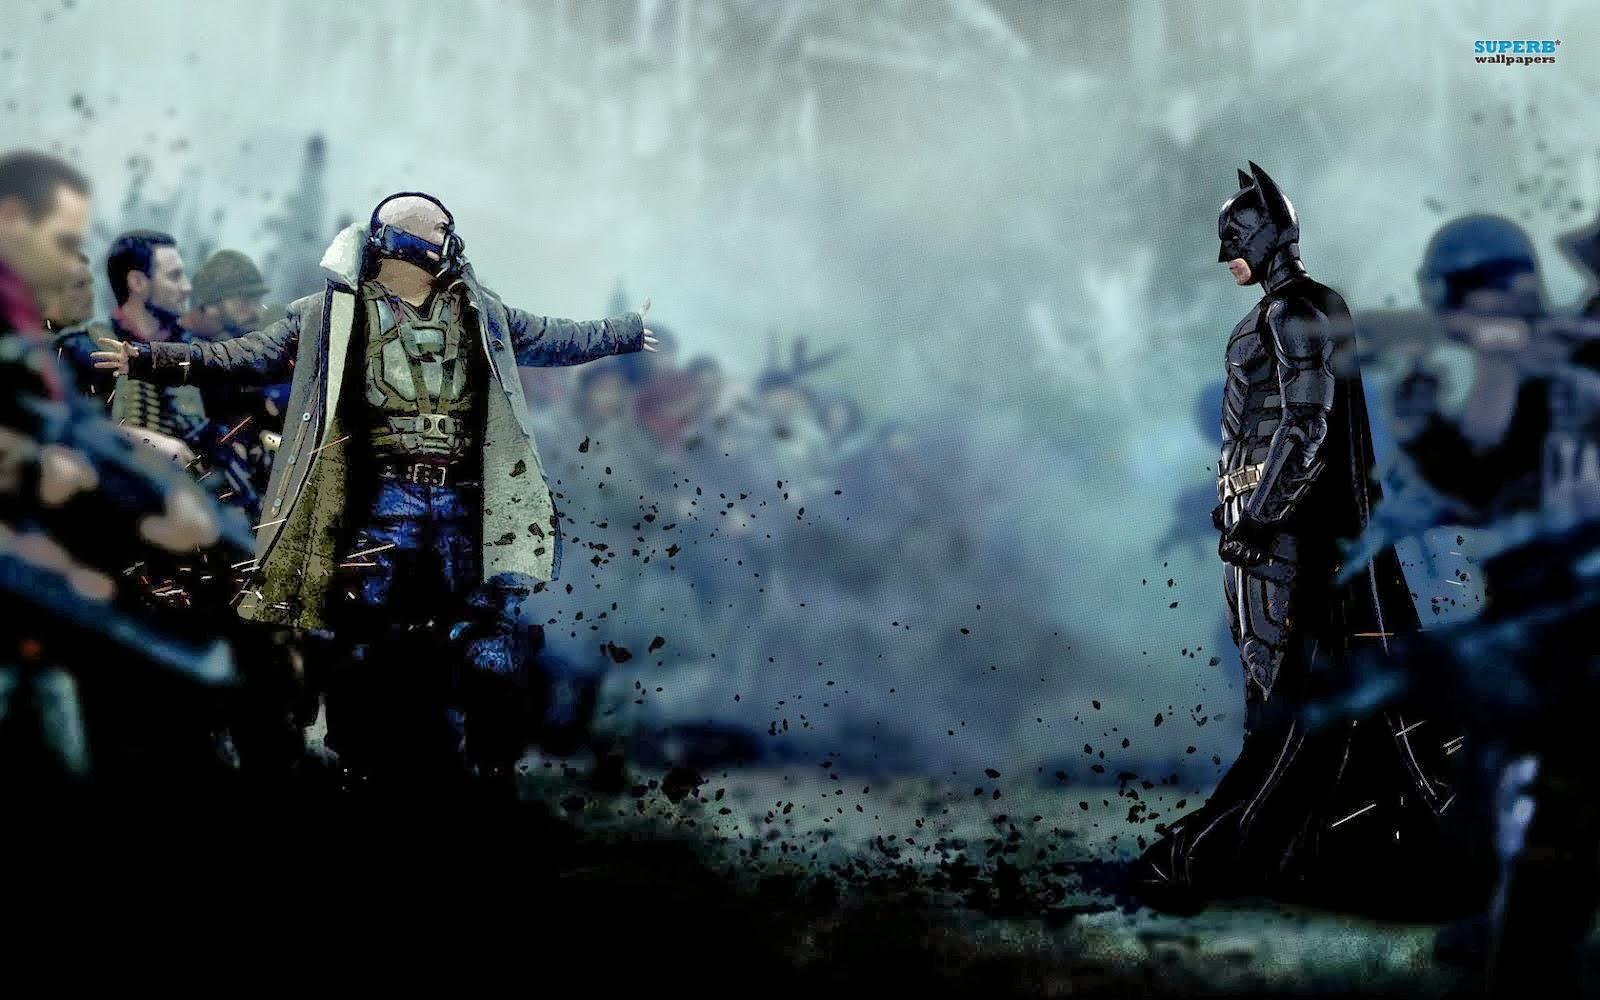 BANE AND BATMAN THE DARK KNIGHT RISES FREE WALLPAPERS - batman hd